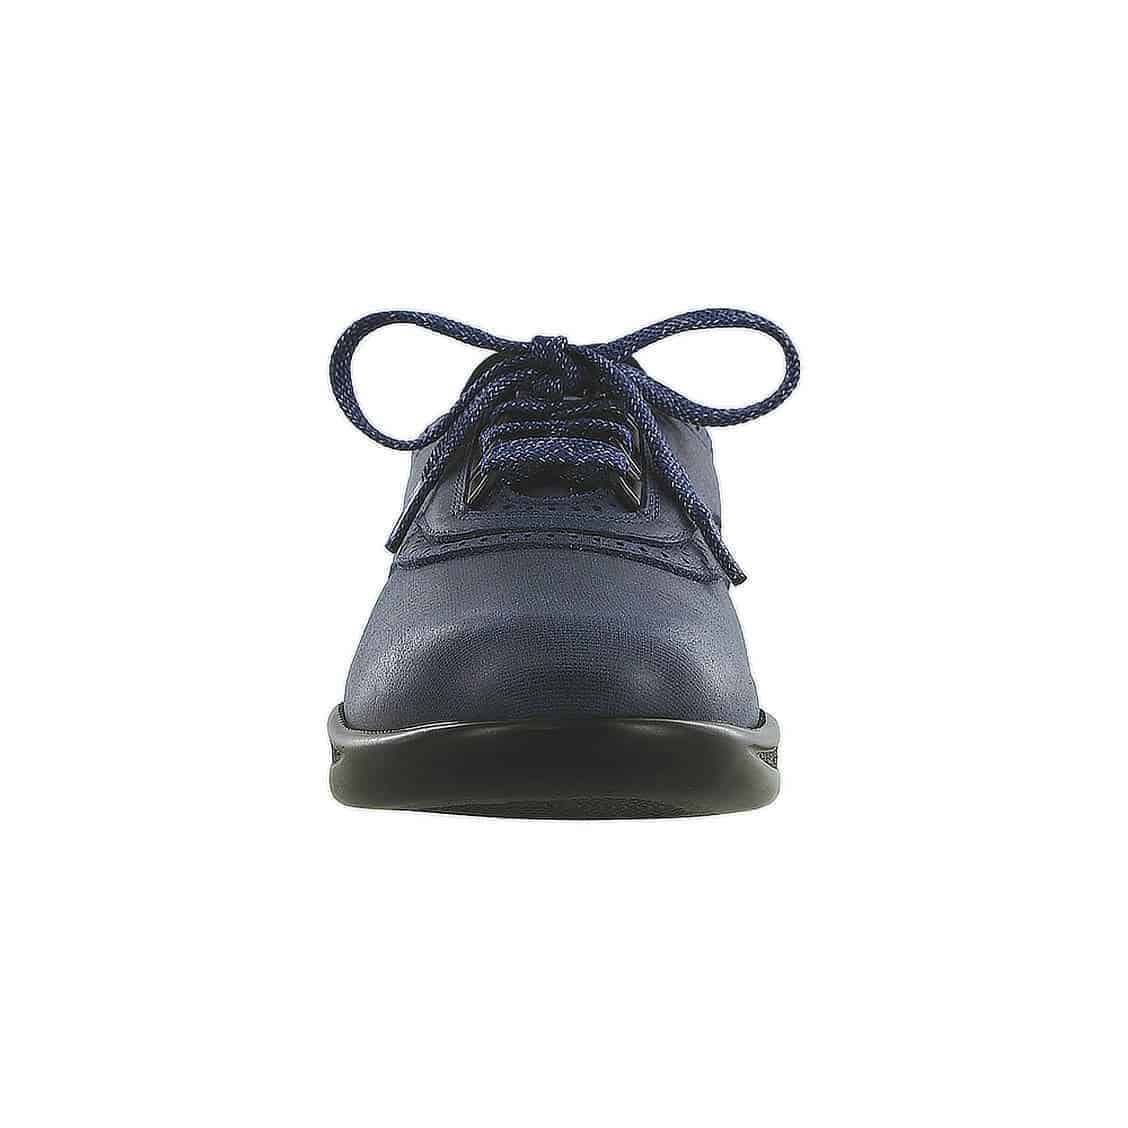 sas-womens-walk-easy-indigo-2380-700-5